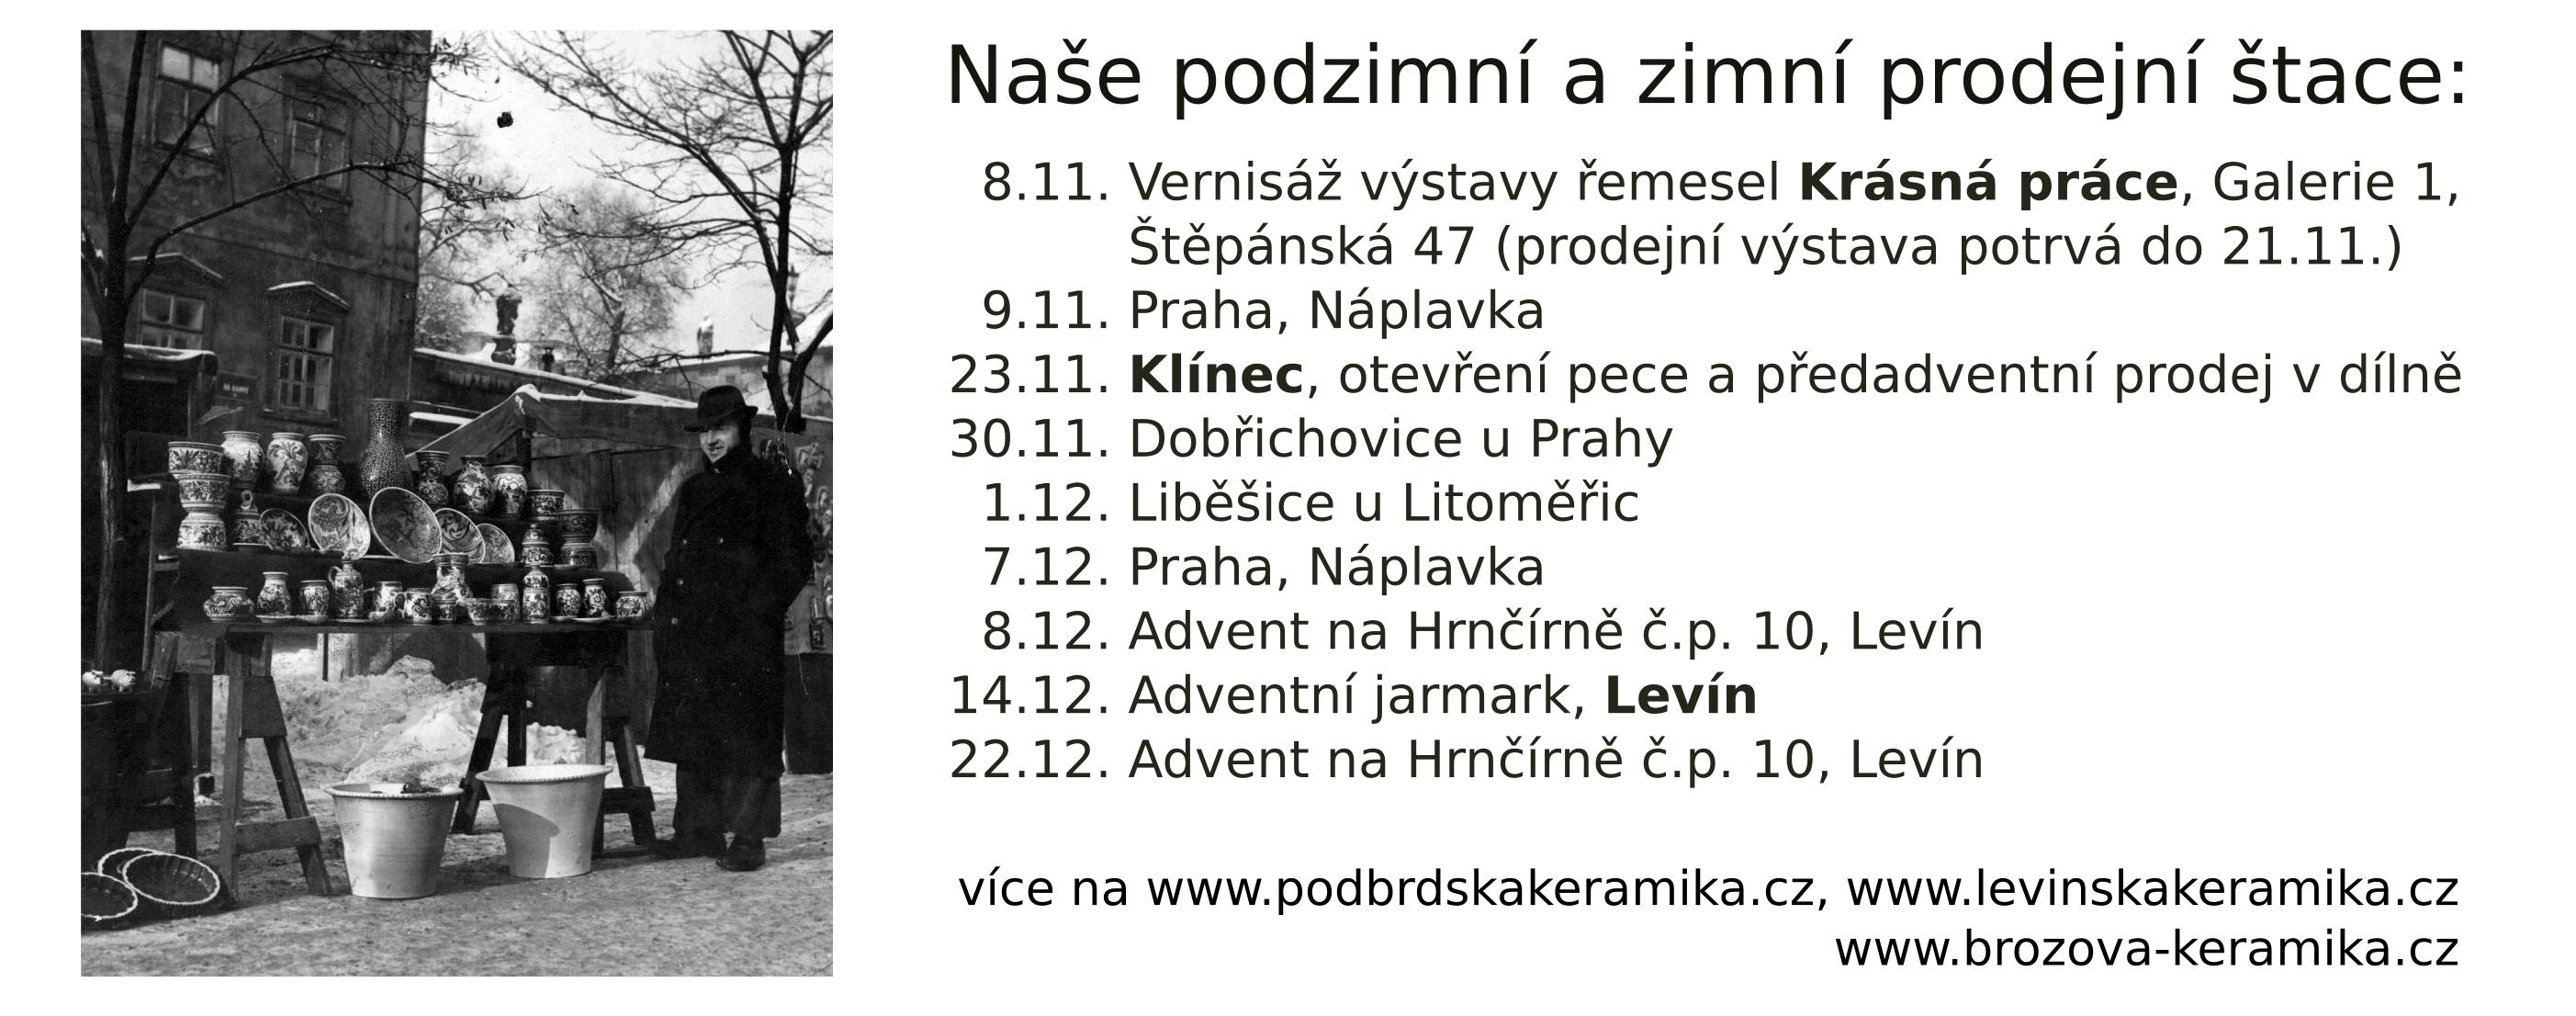 zimni_stace2019